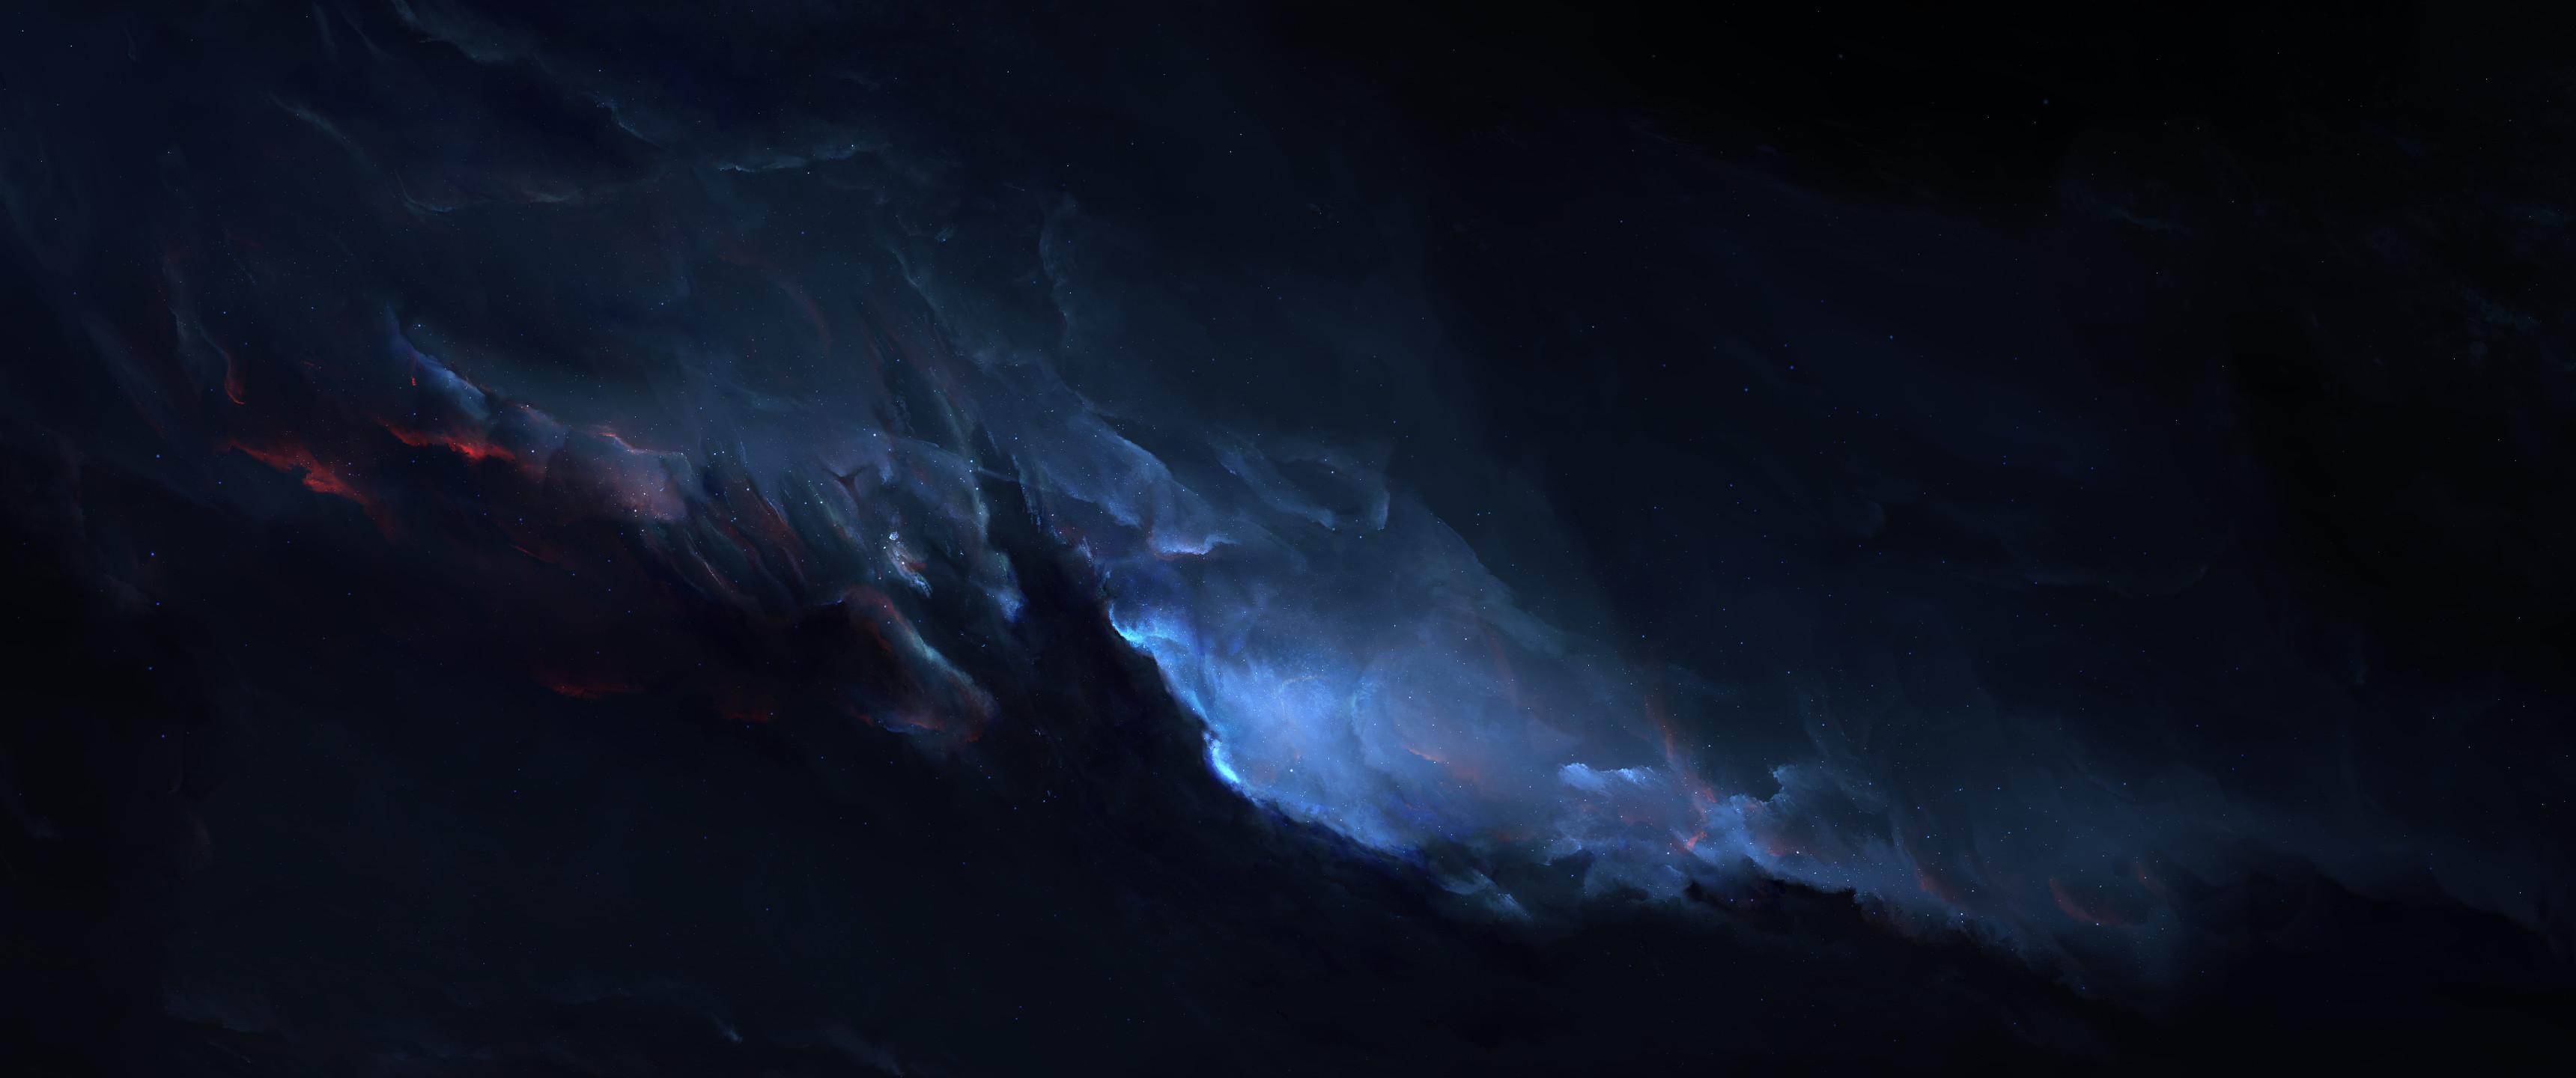 ultrawide Astrophotography Space Blue Wallpapers HD Desktop